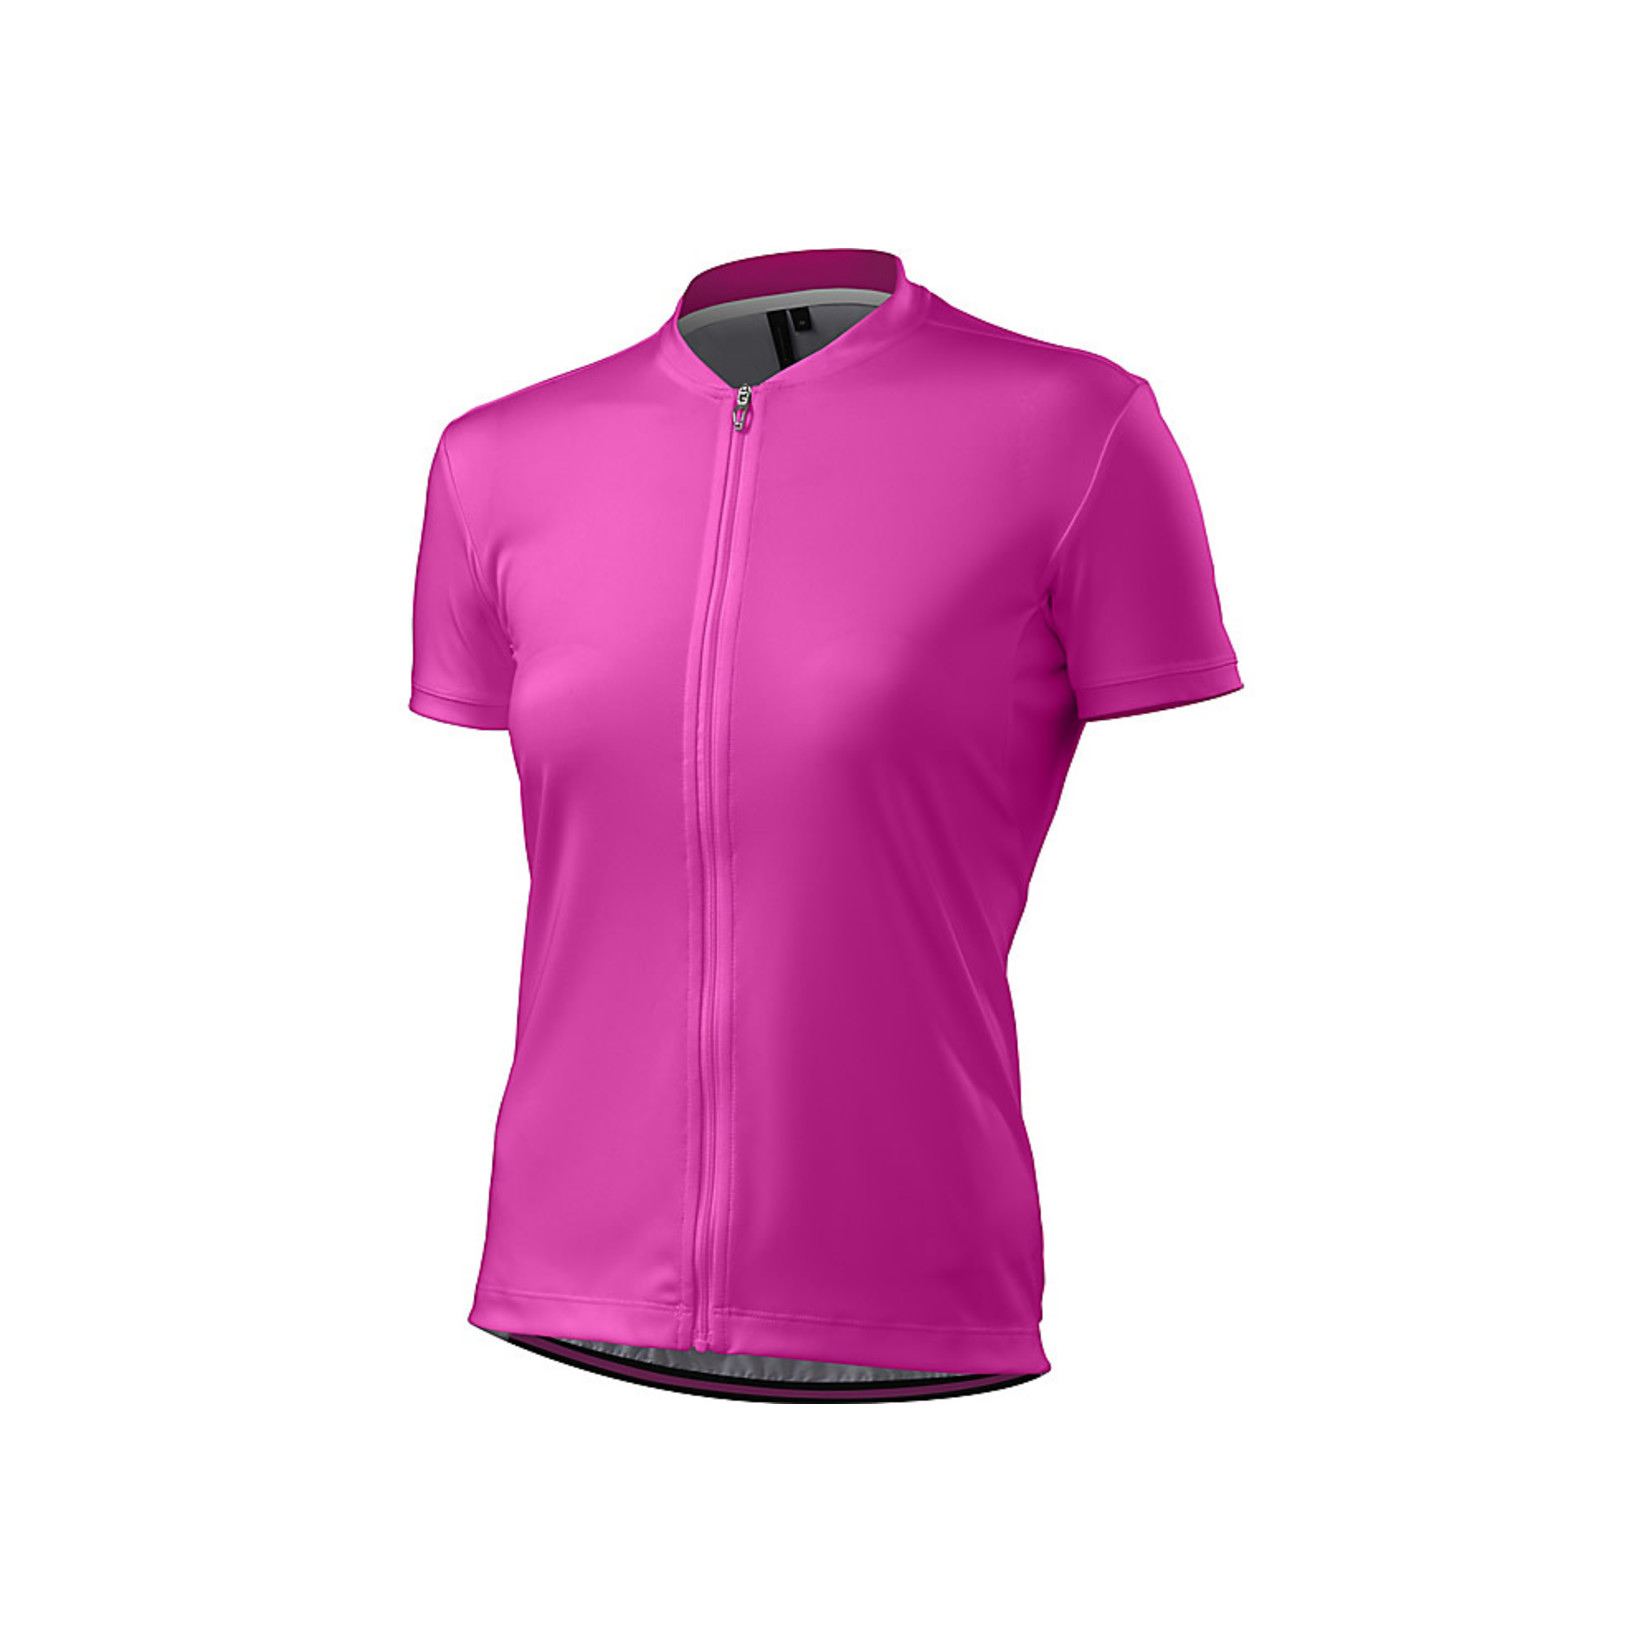 Specialized Women's RBX Sport Jersey Neon Pink Medium